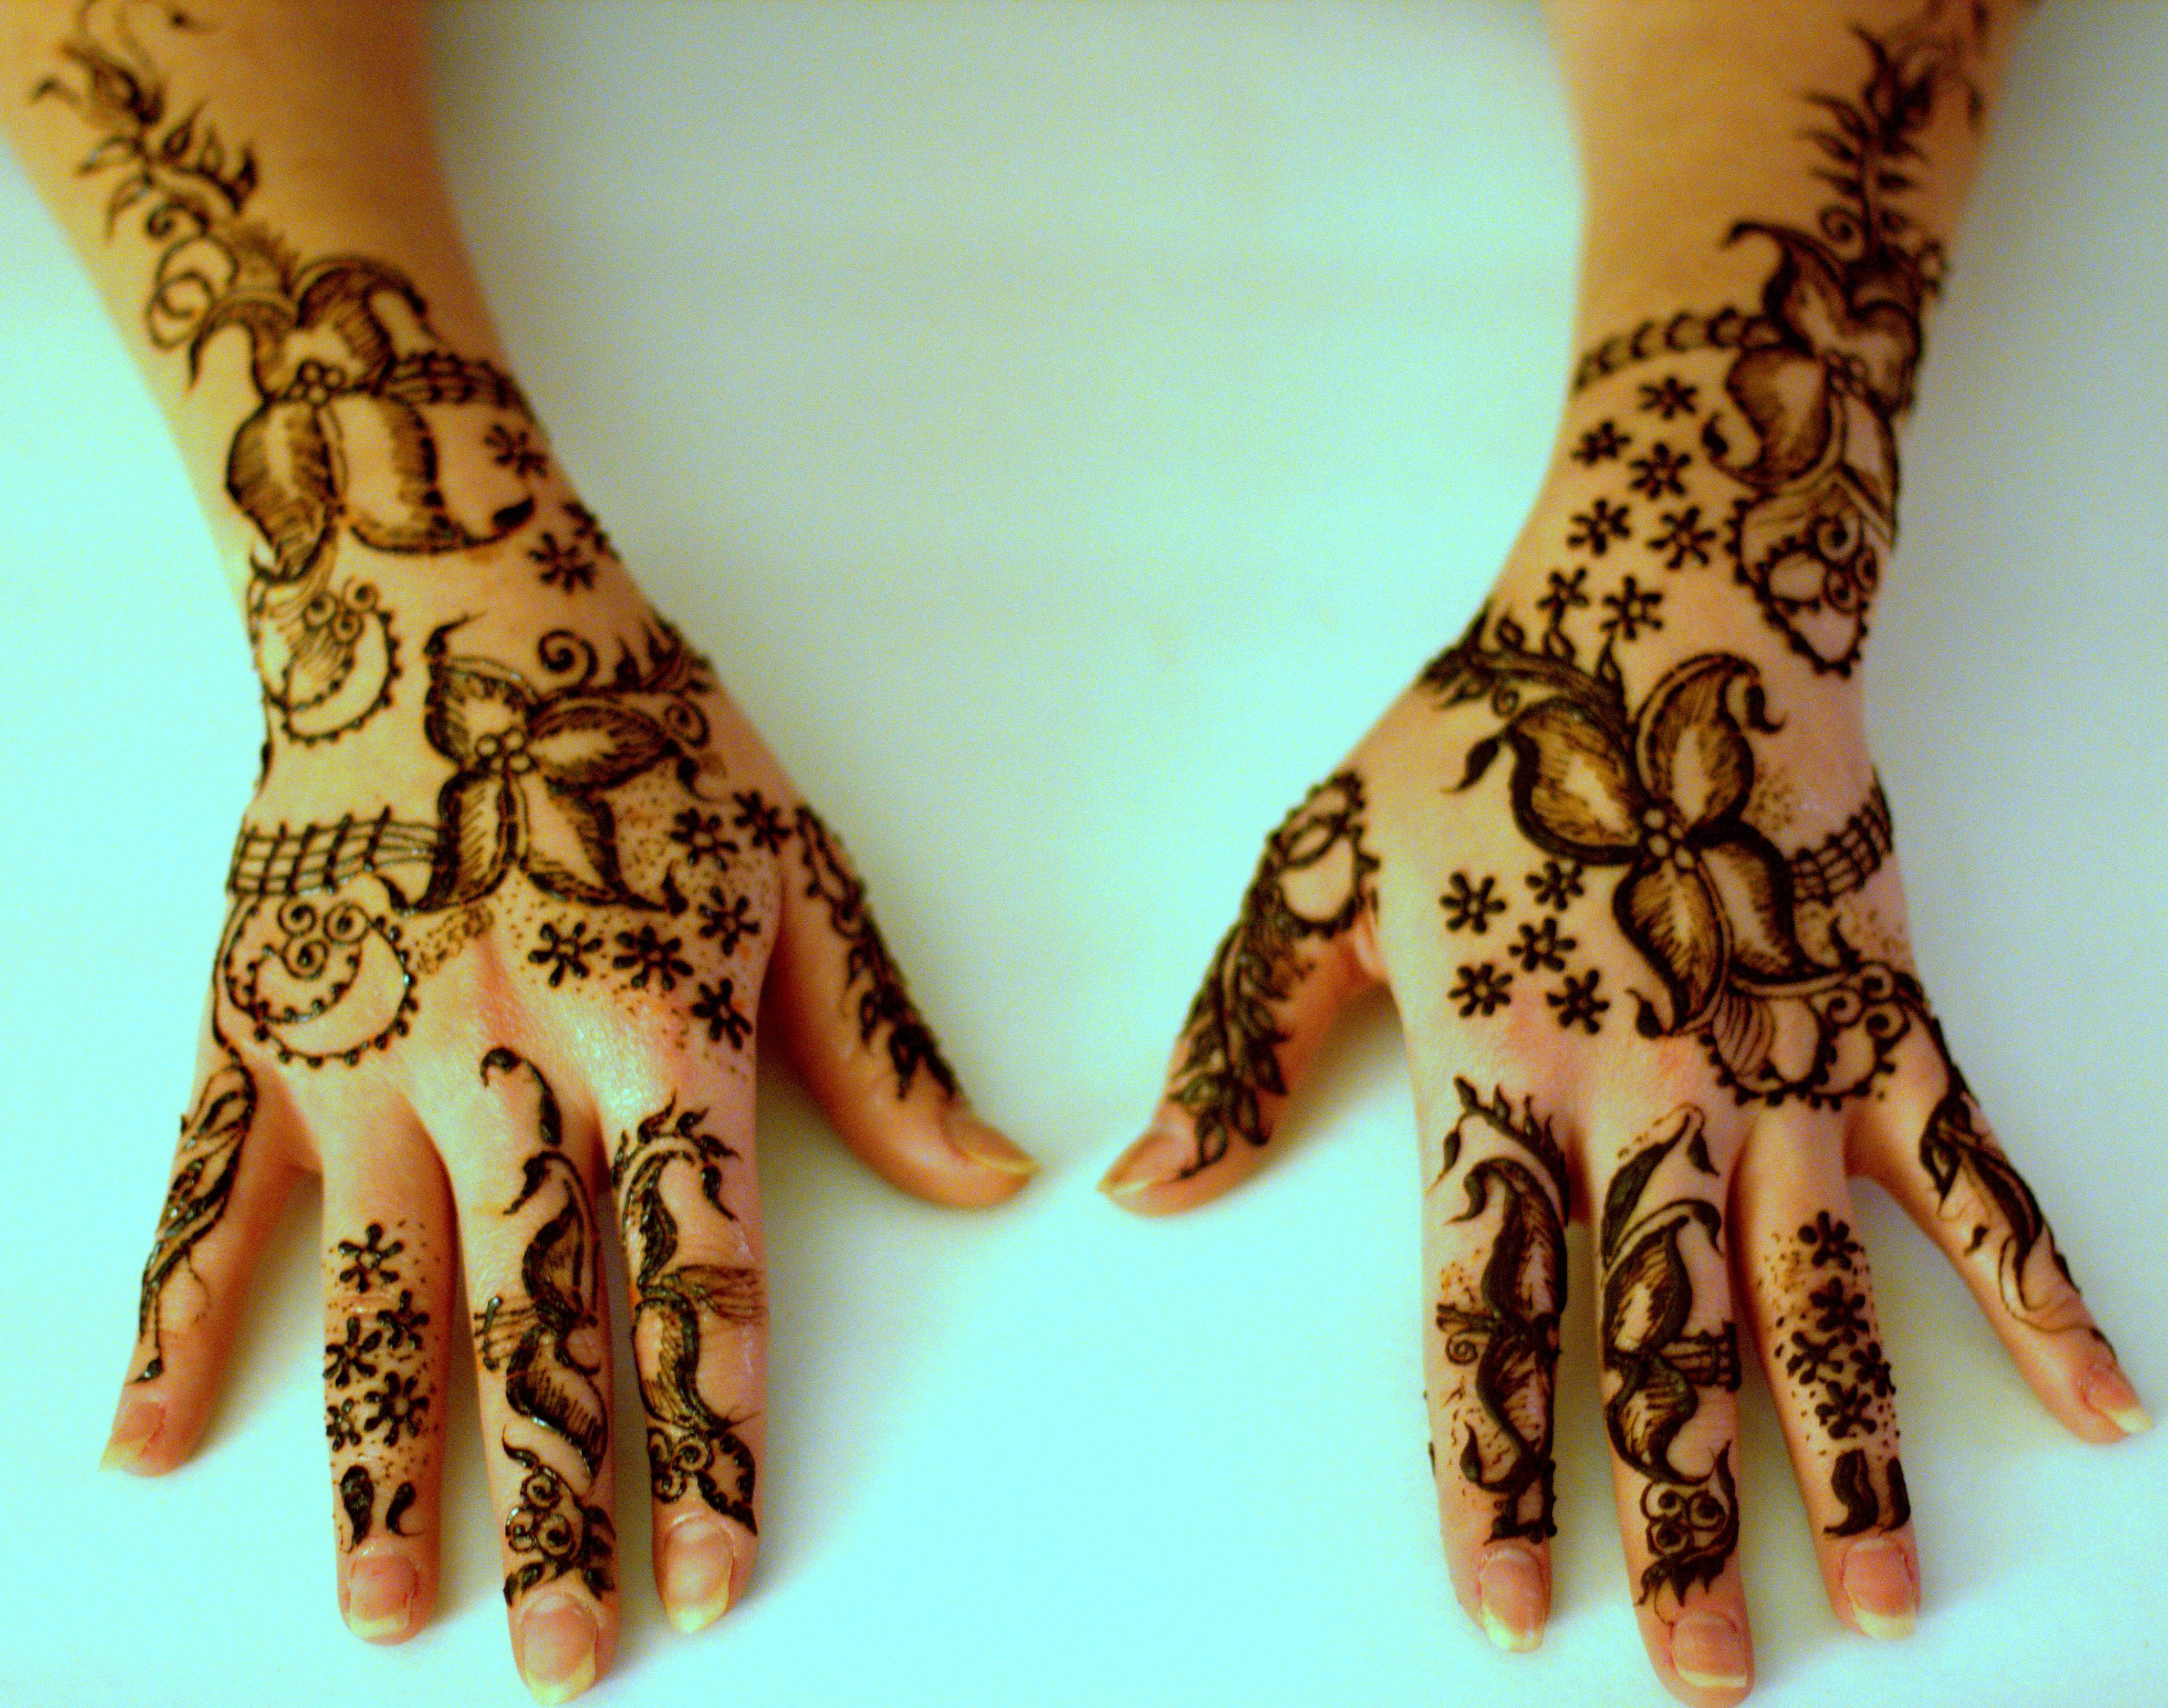 Gulf Style Henna Design For A Client Henna Dc Mehndi Northern Va